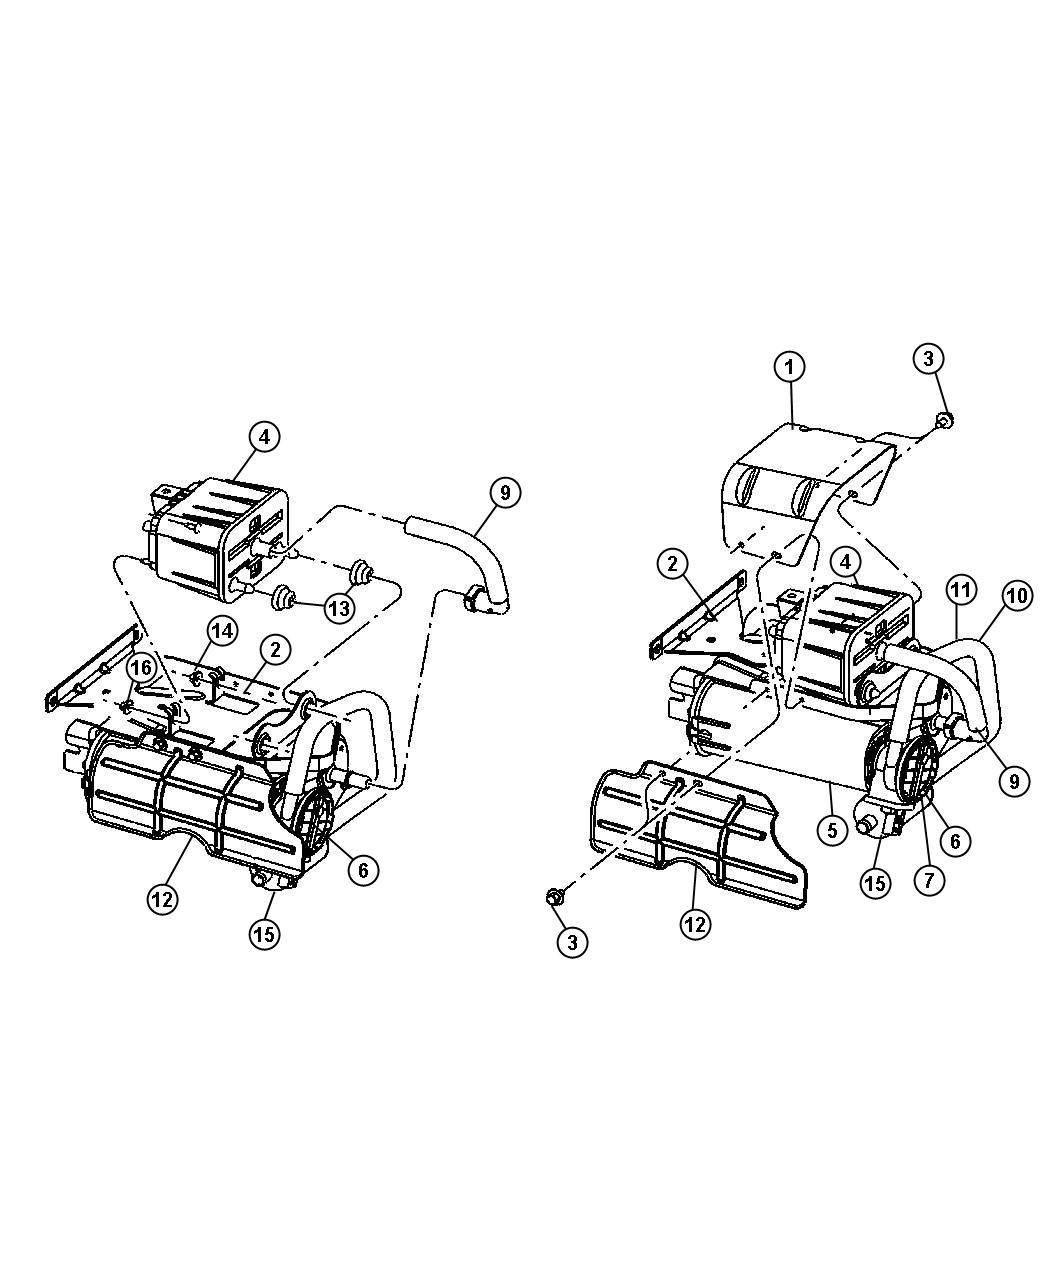 Dodge Caravan Pump Leak Detection Leak Detection W O